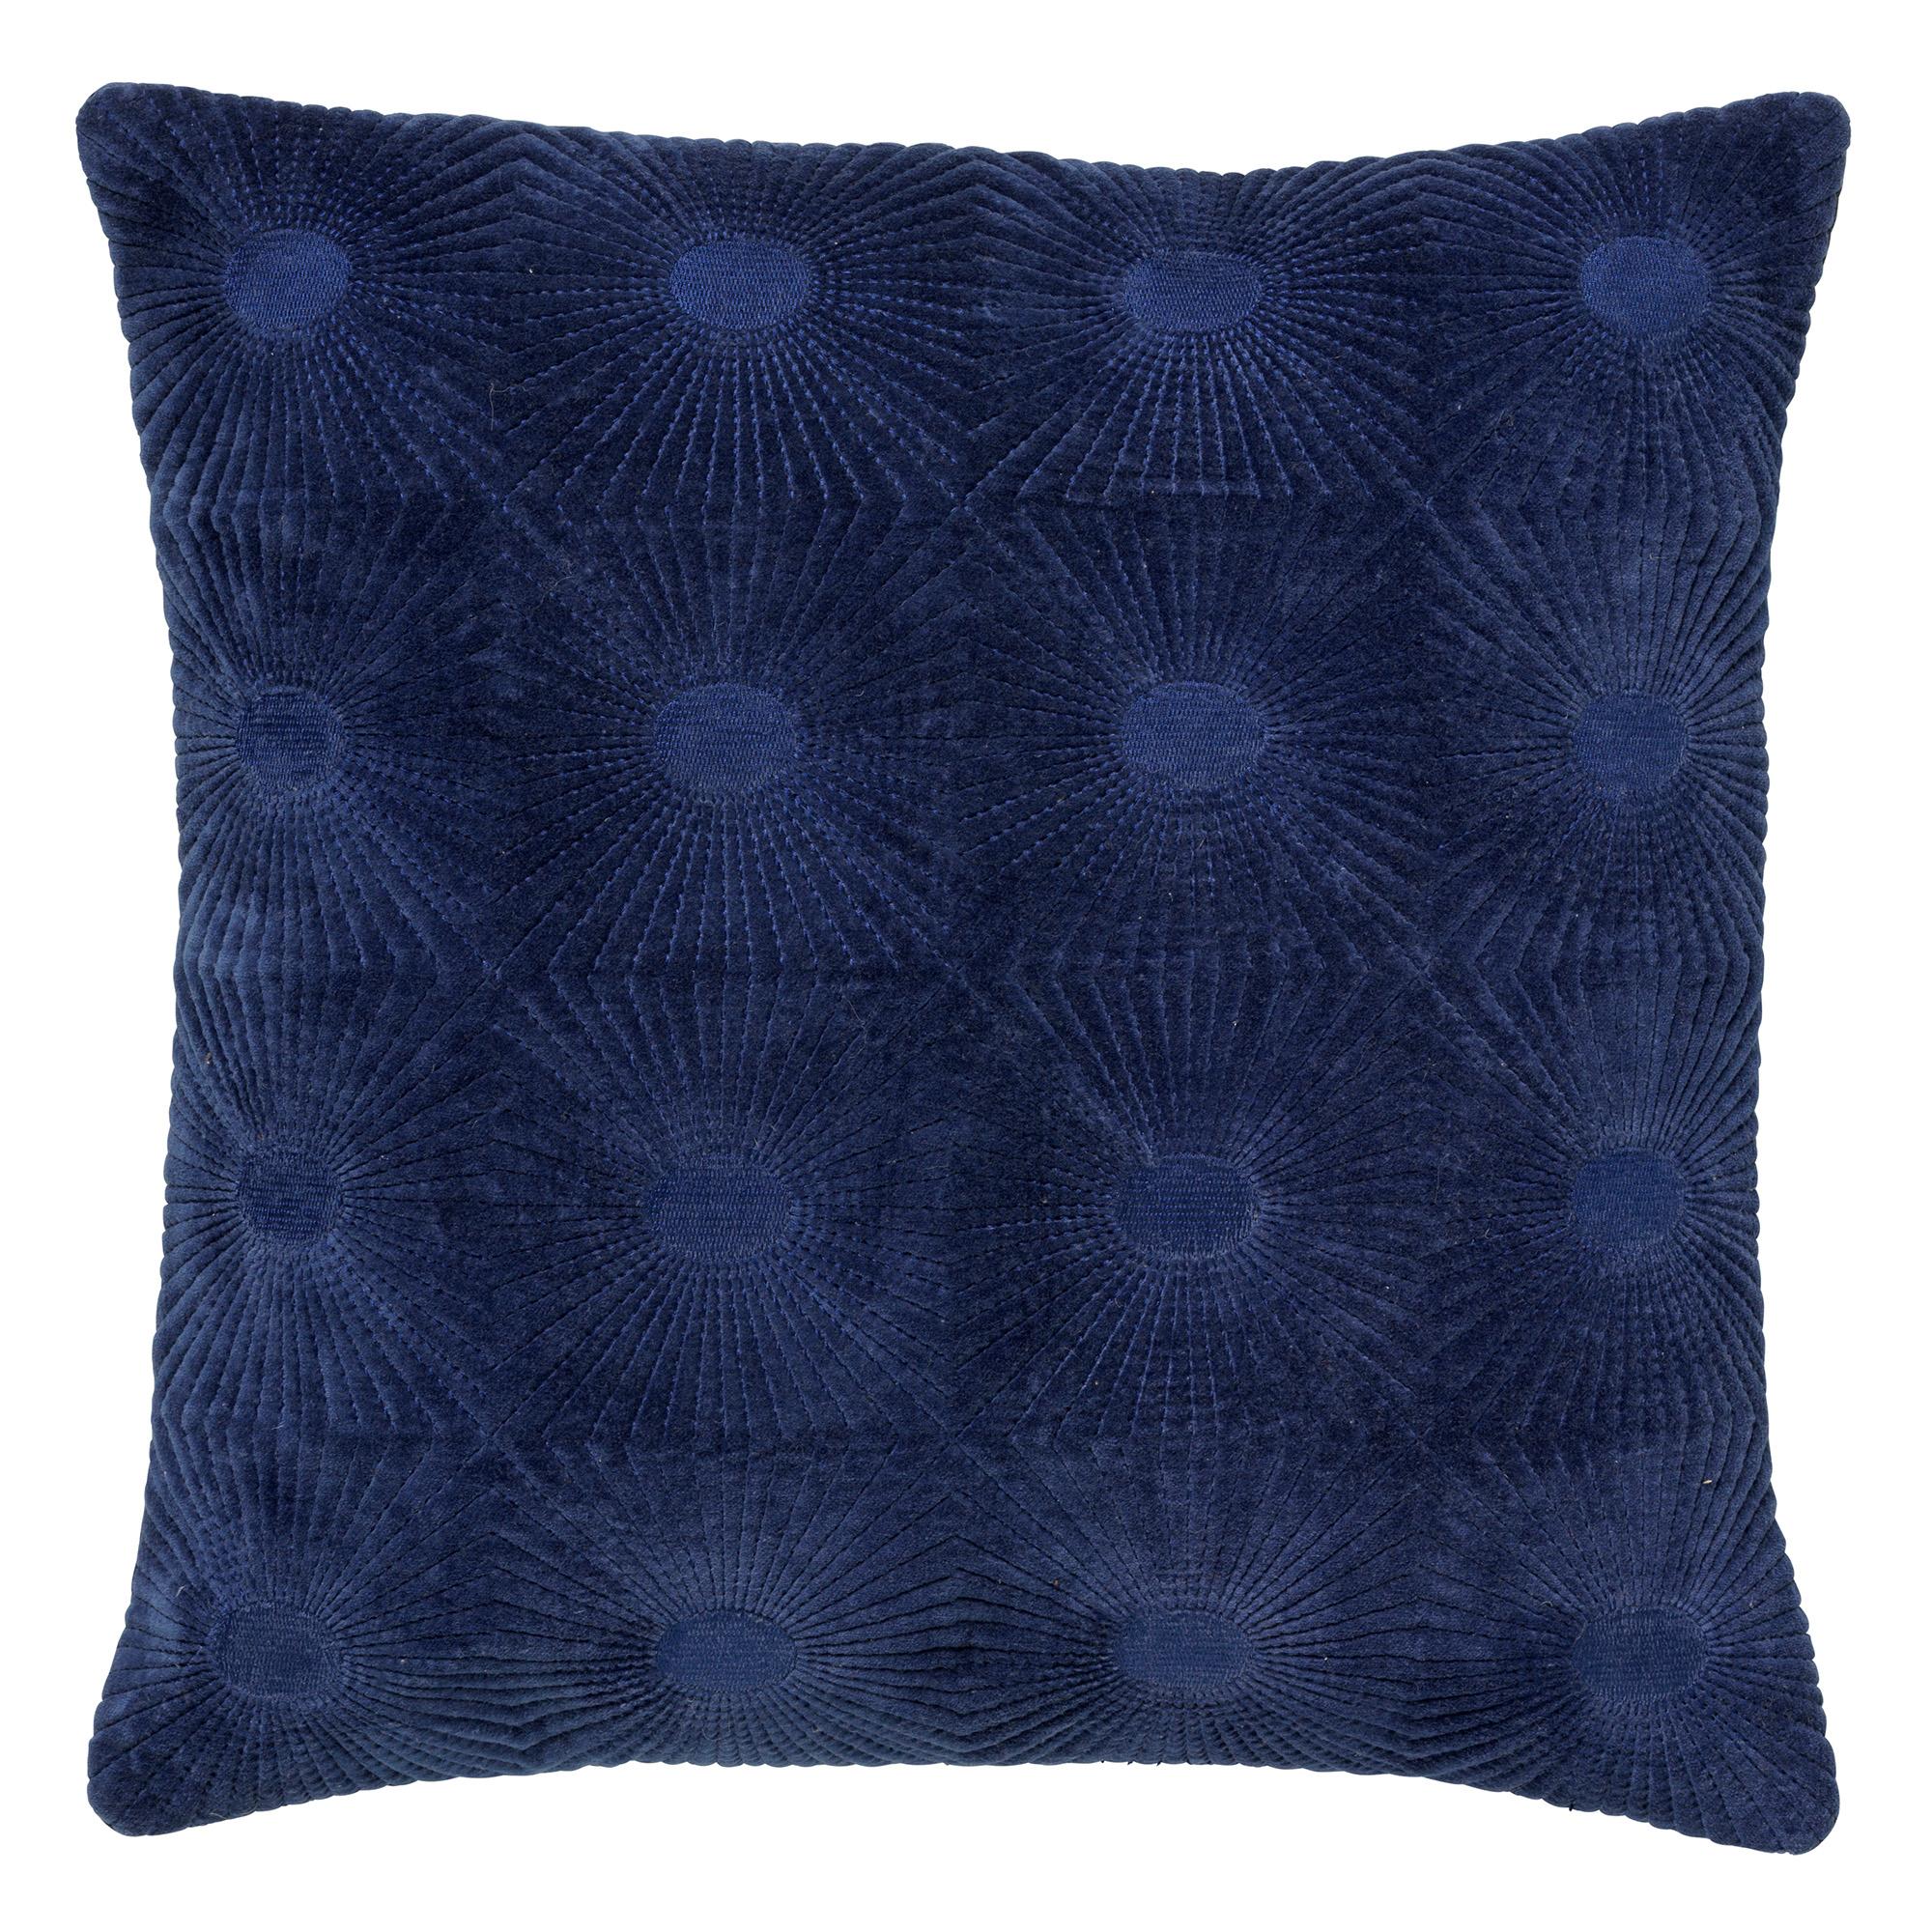 SUN - Kussenhoes van katoen 45x45 cm Insignia Blue